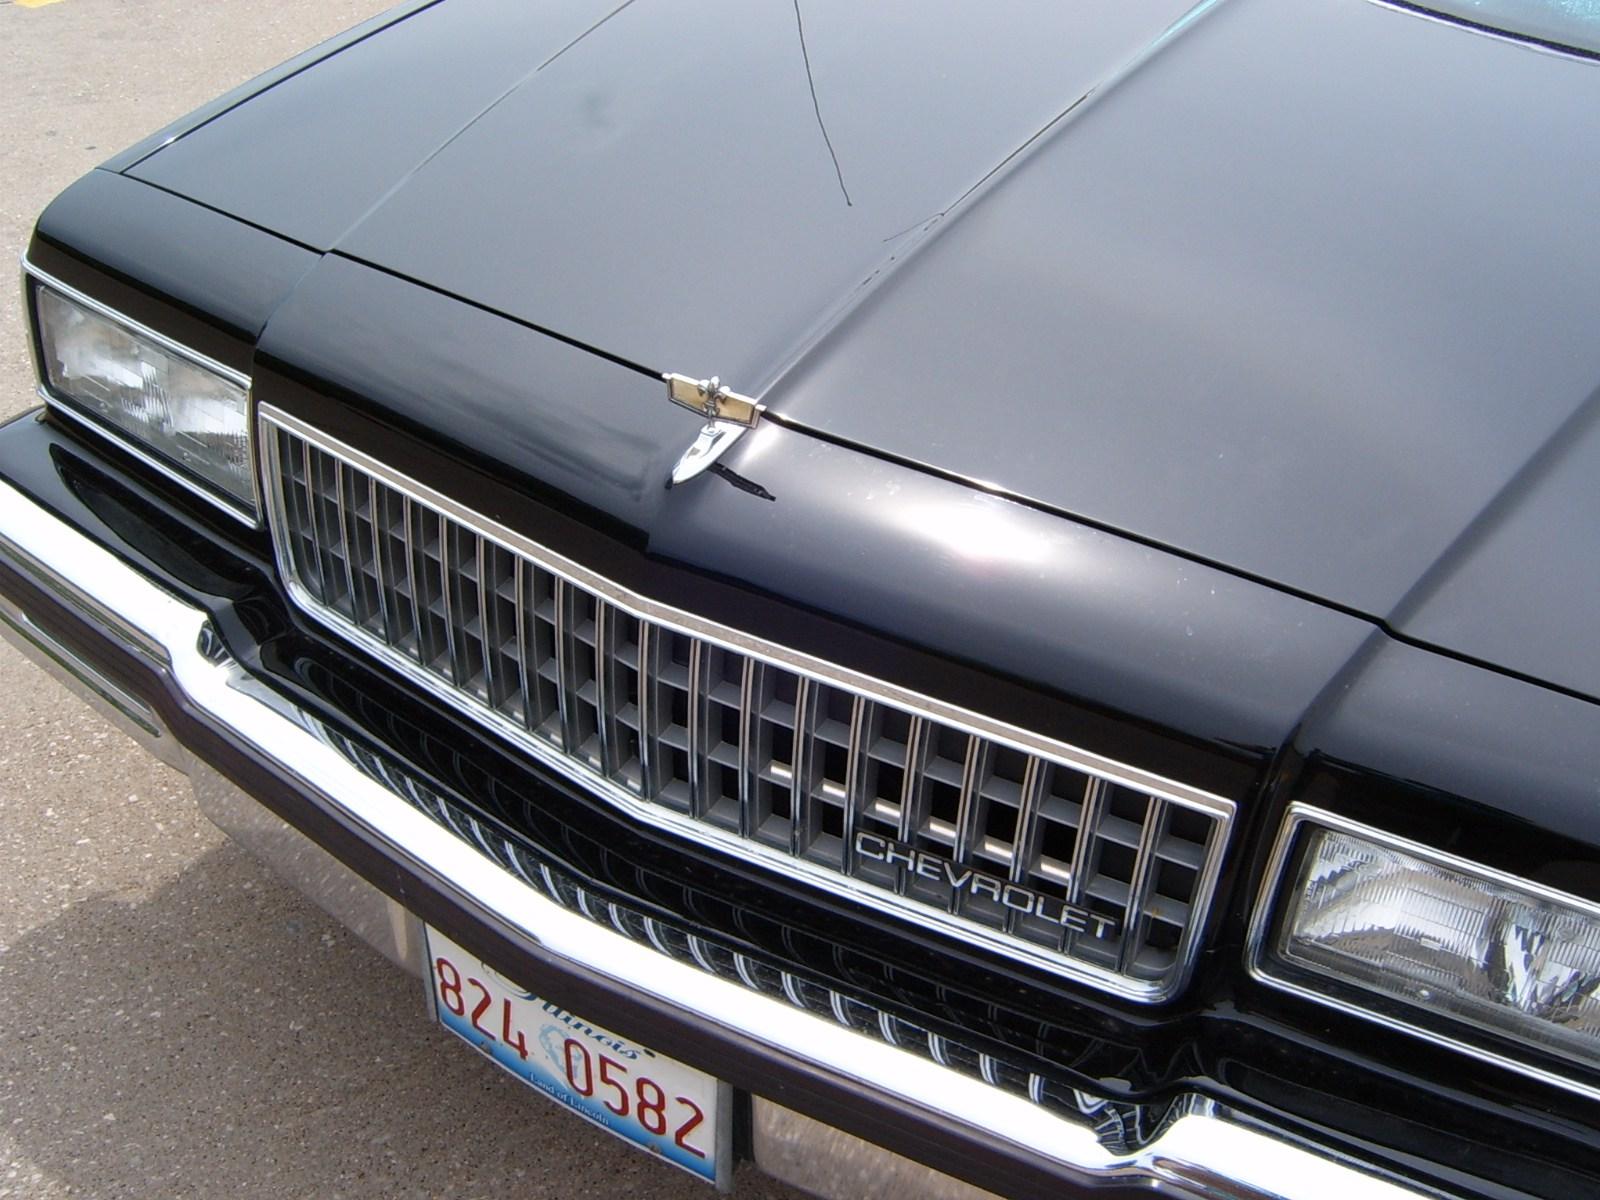 Chevrolet Caprice VI 2006 - now Sedan #1